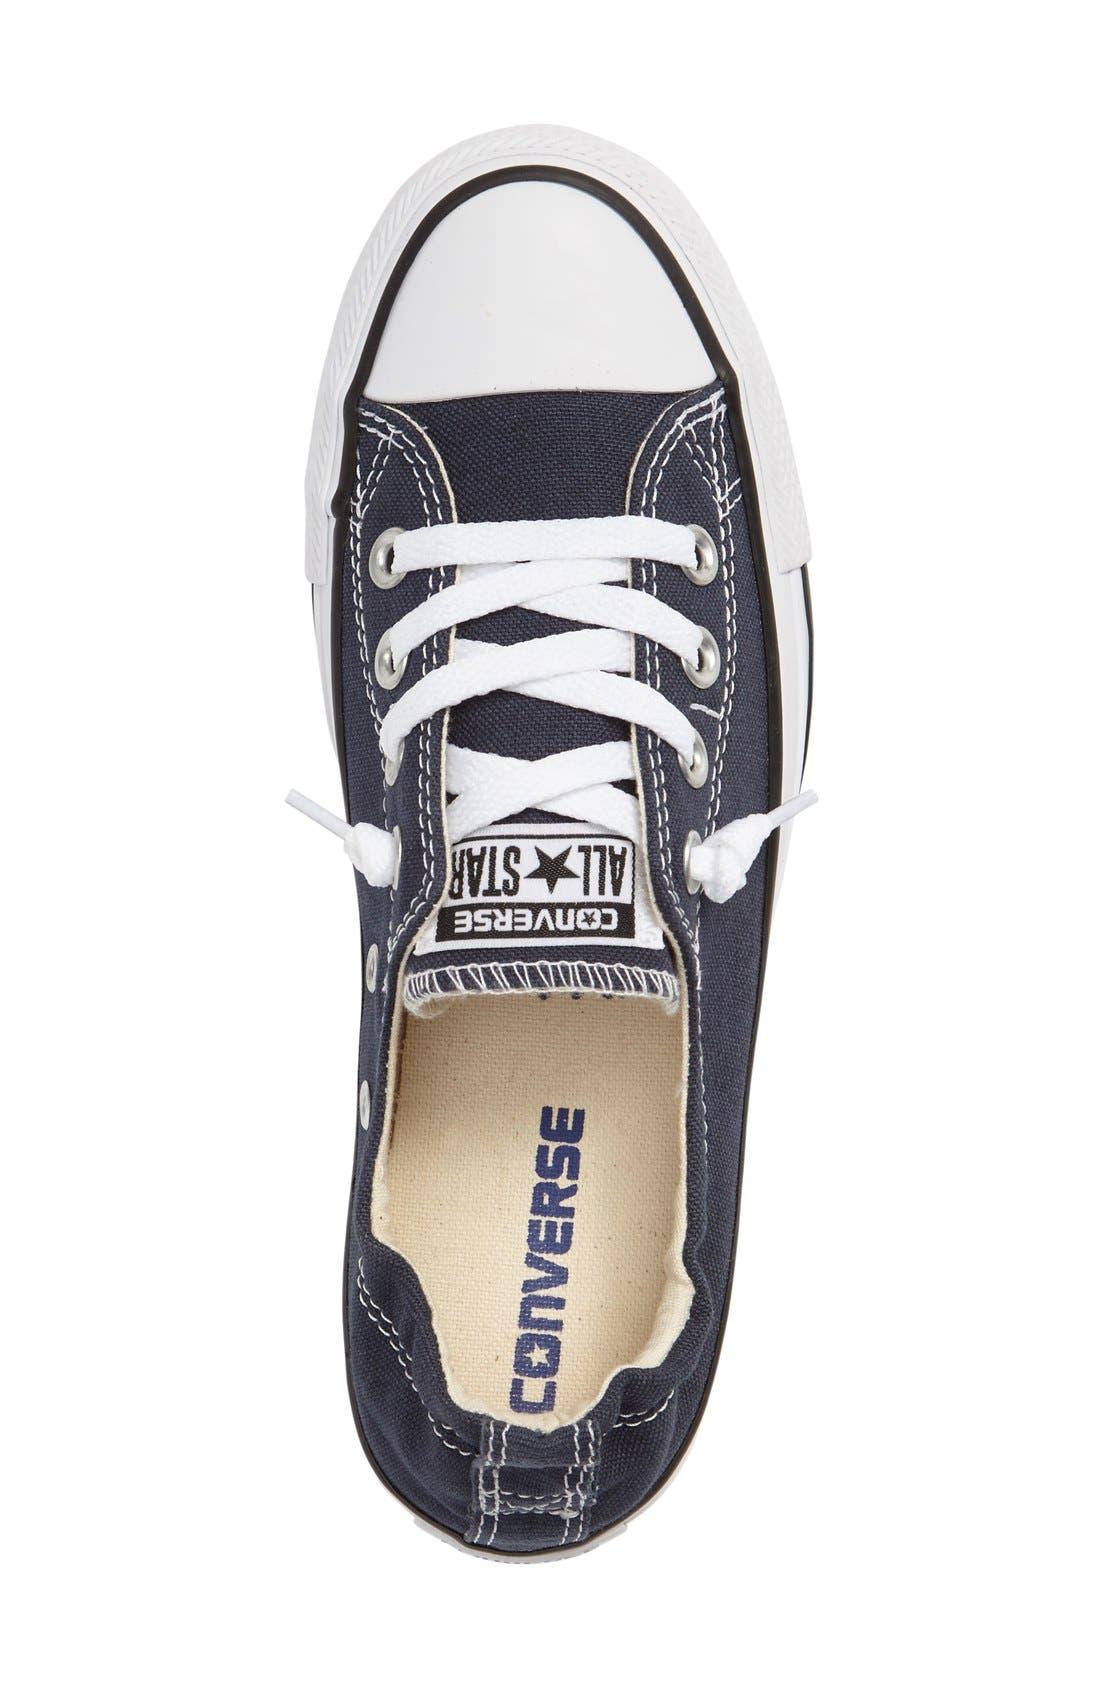 Chuck Taylor<sup>®</sup> 'Shoreline' Sneaker,                             Alternate thumbnail 8, color,                             NAVY